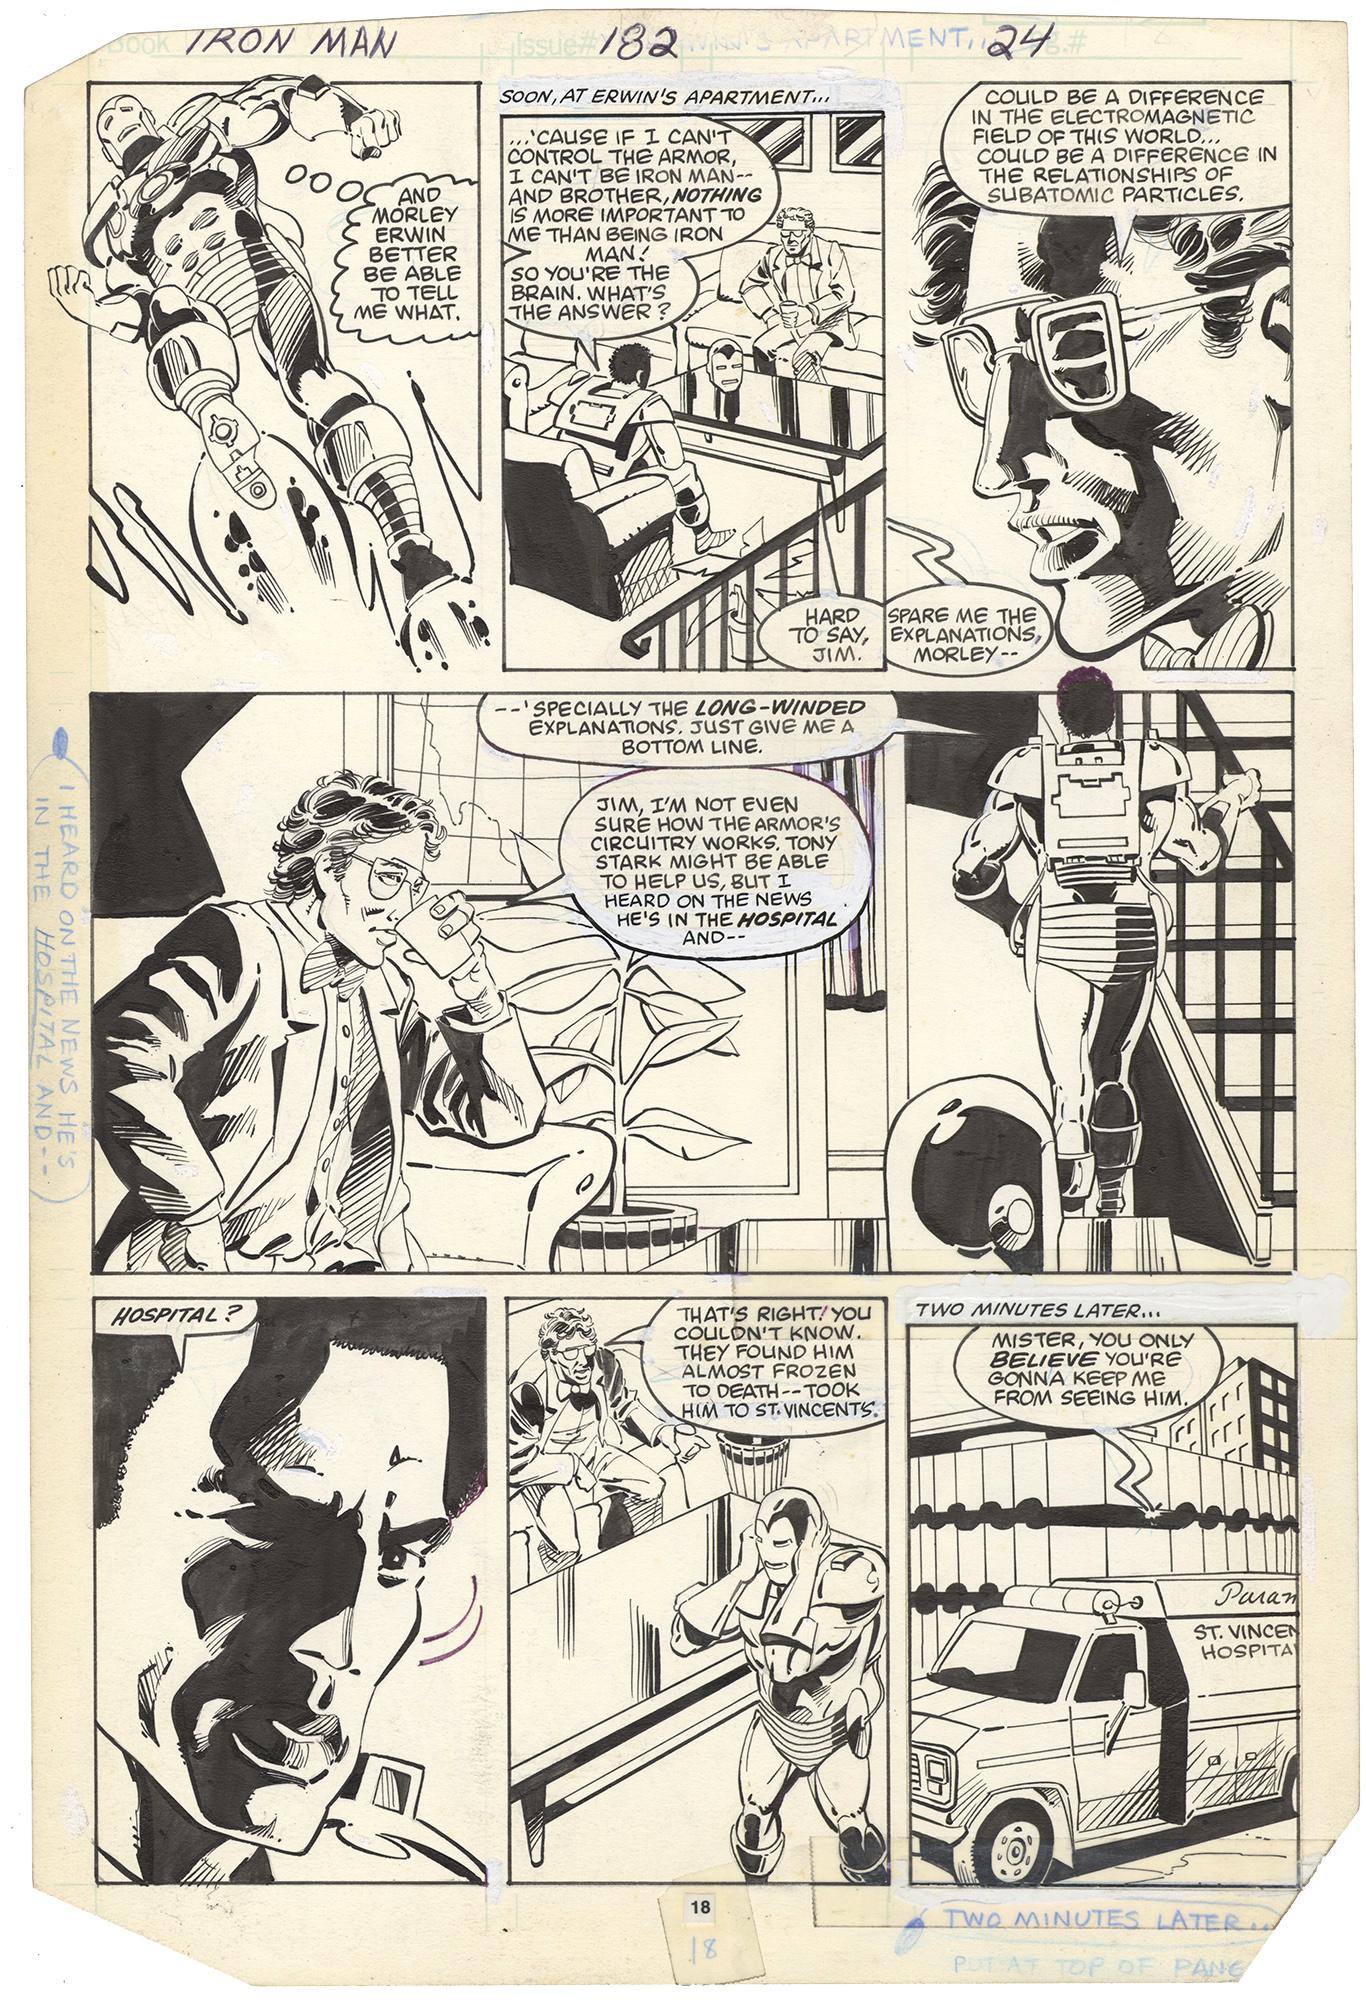 Iron Man #182 p18